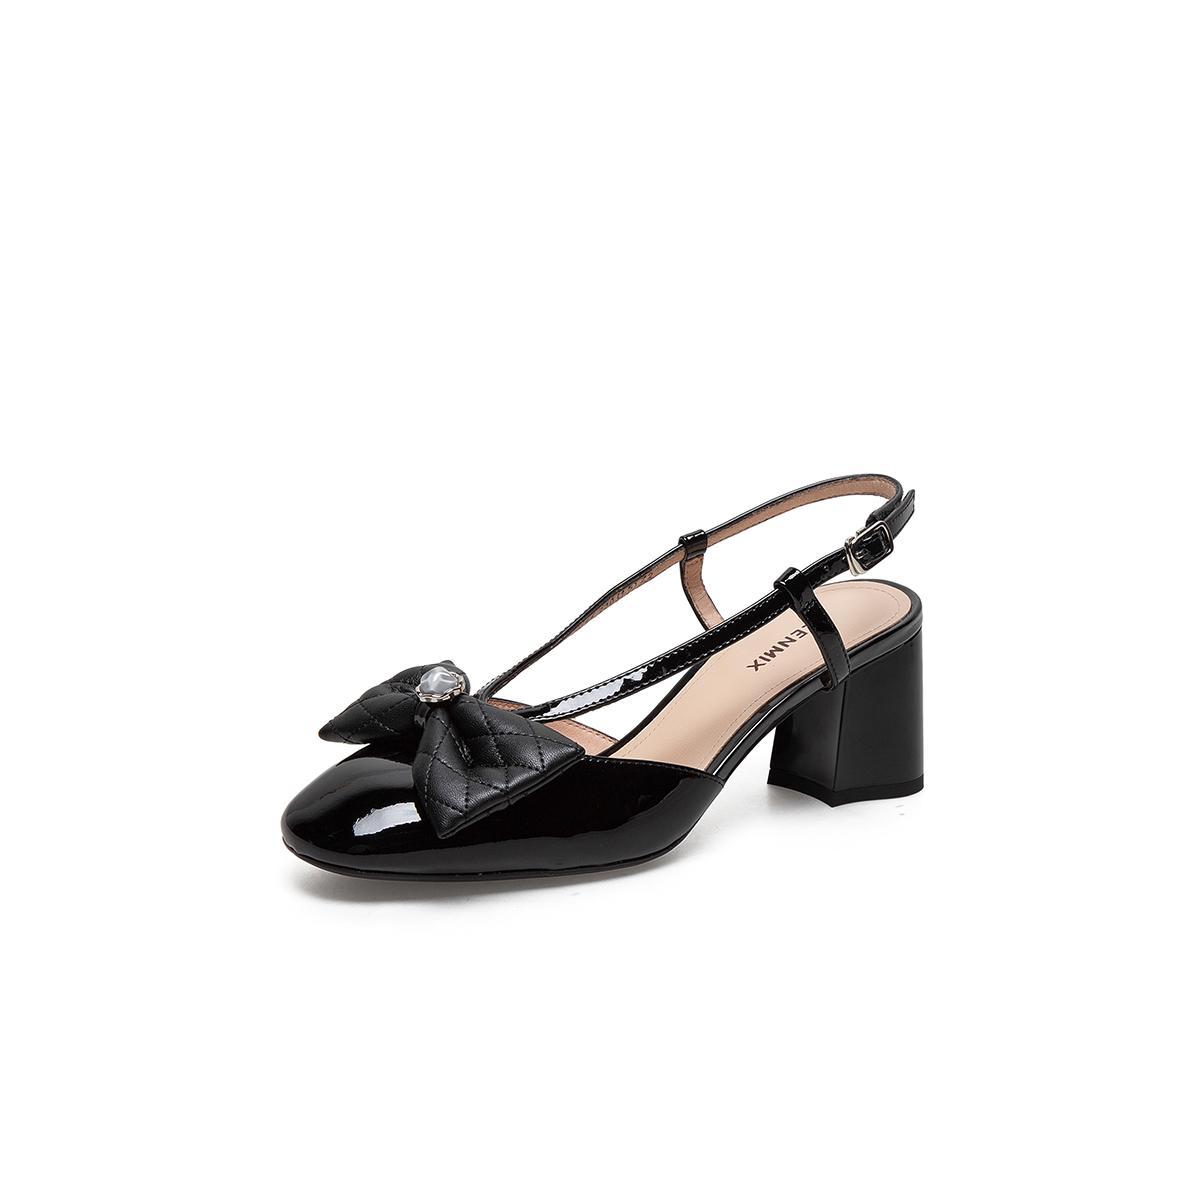 TEENMIX 天美意 TBLCHT35DU1BH1  女士甜美蝴蝶结粗高跟凉鞋